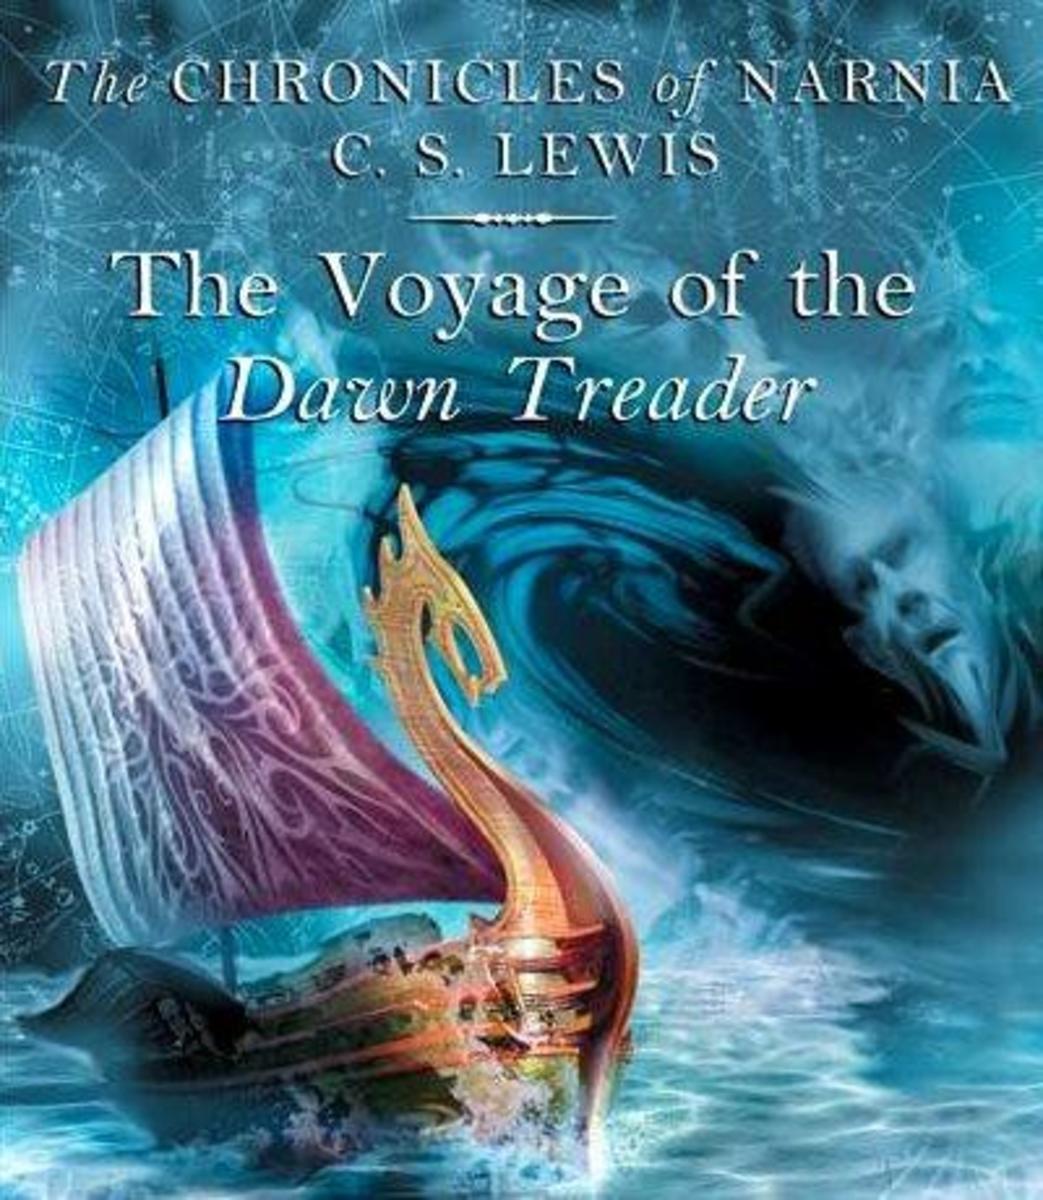 voyage-of-the-dawn-treader-a-comparison